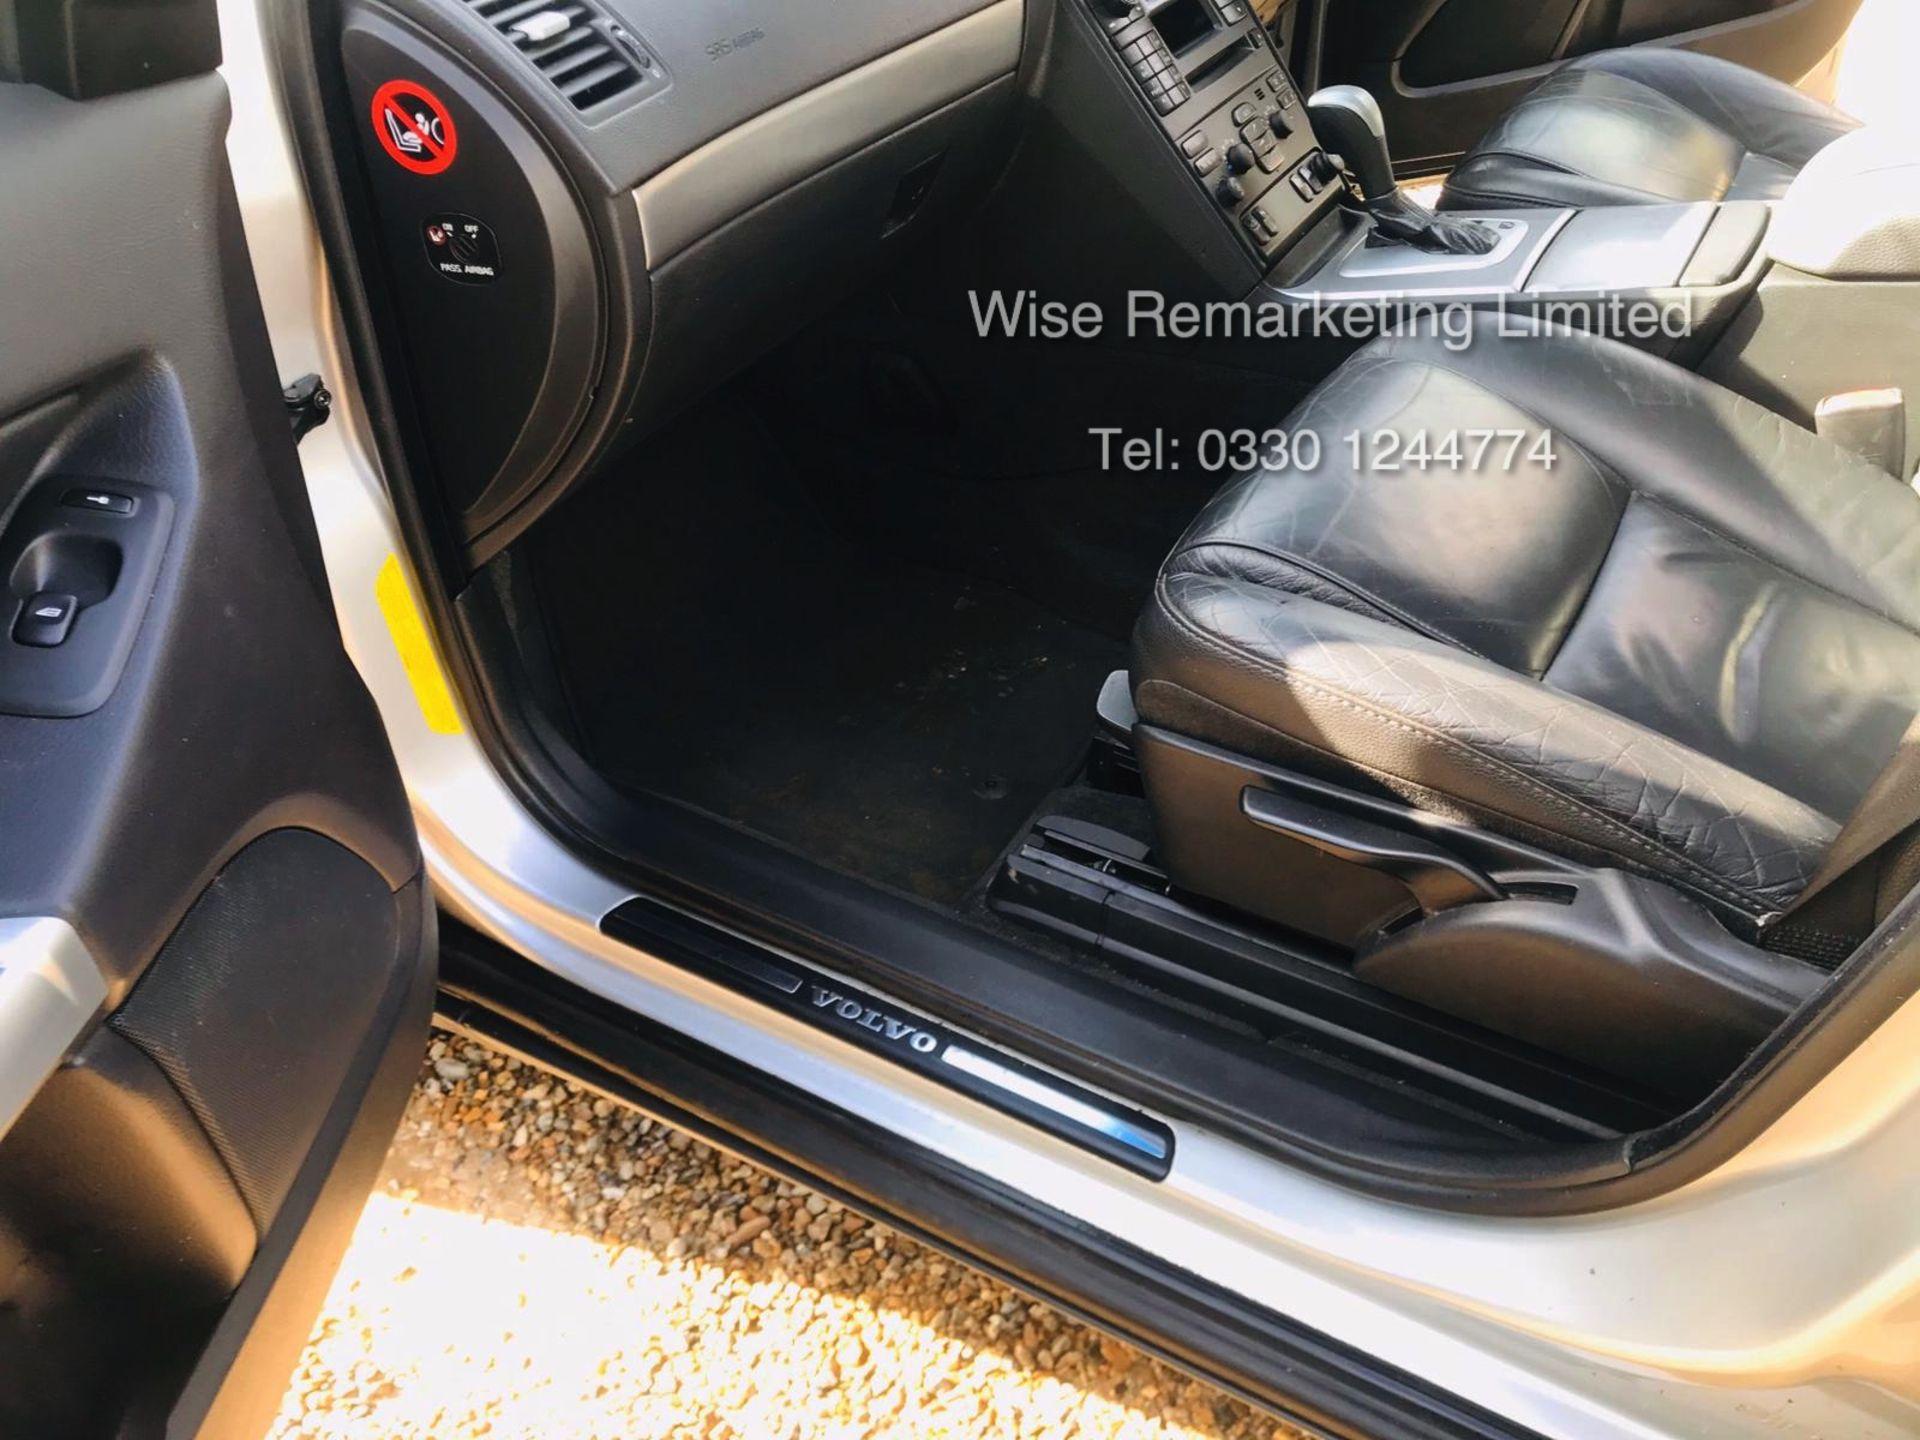 Lot 35 - Volvo XC90 2.4 D5 Special Equipment Geartronic - 2006 06 Reg - Service History - 7 Seats - Sat Nav